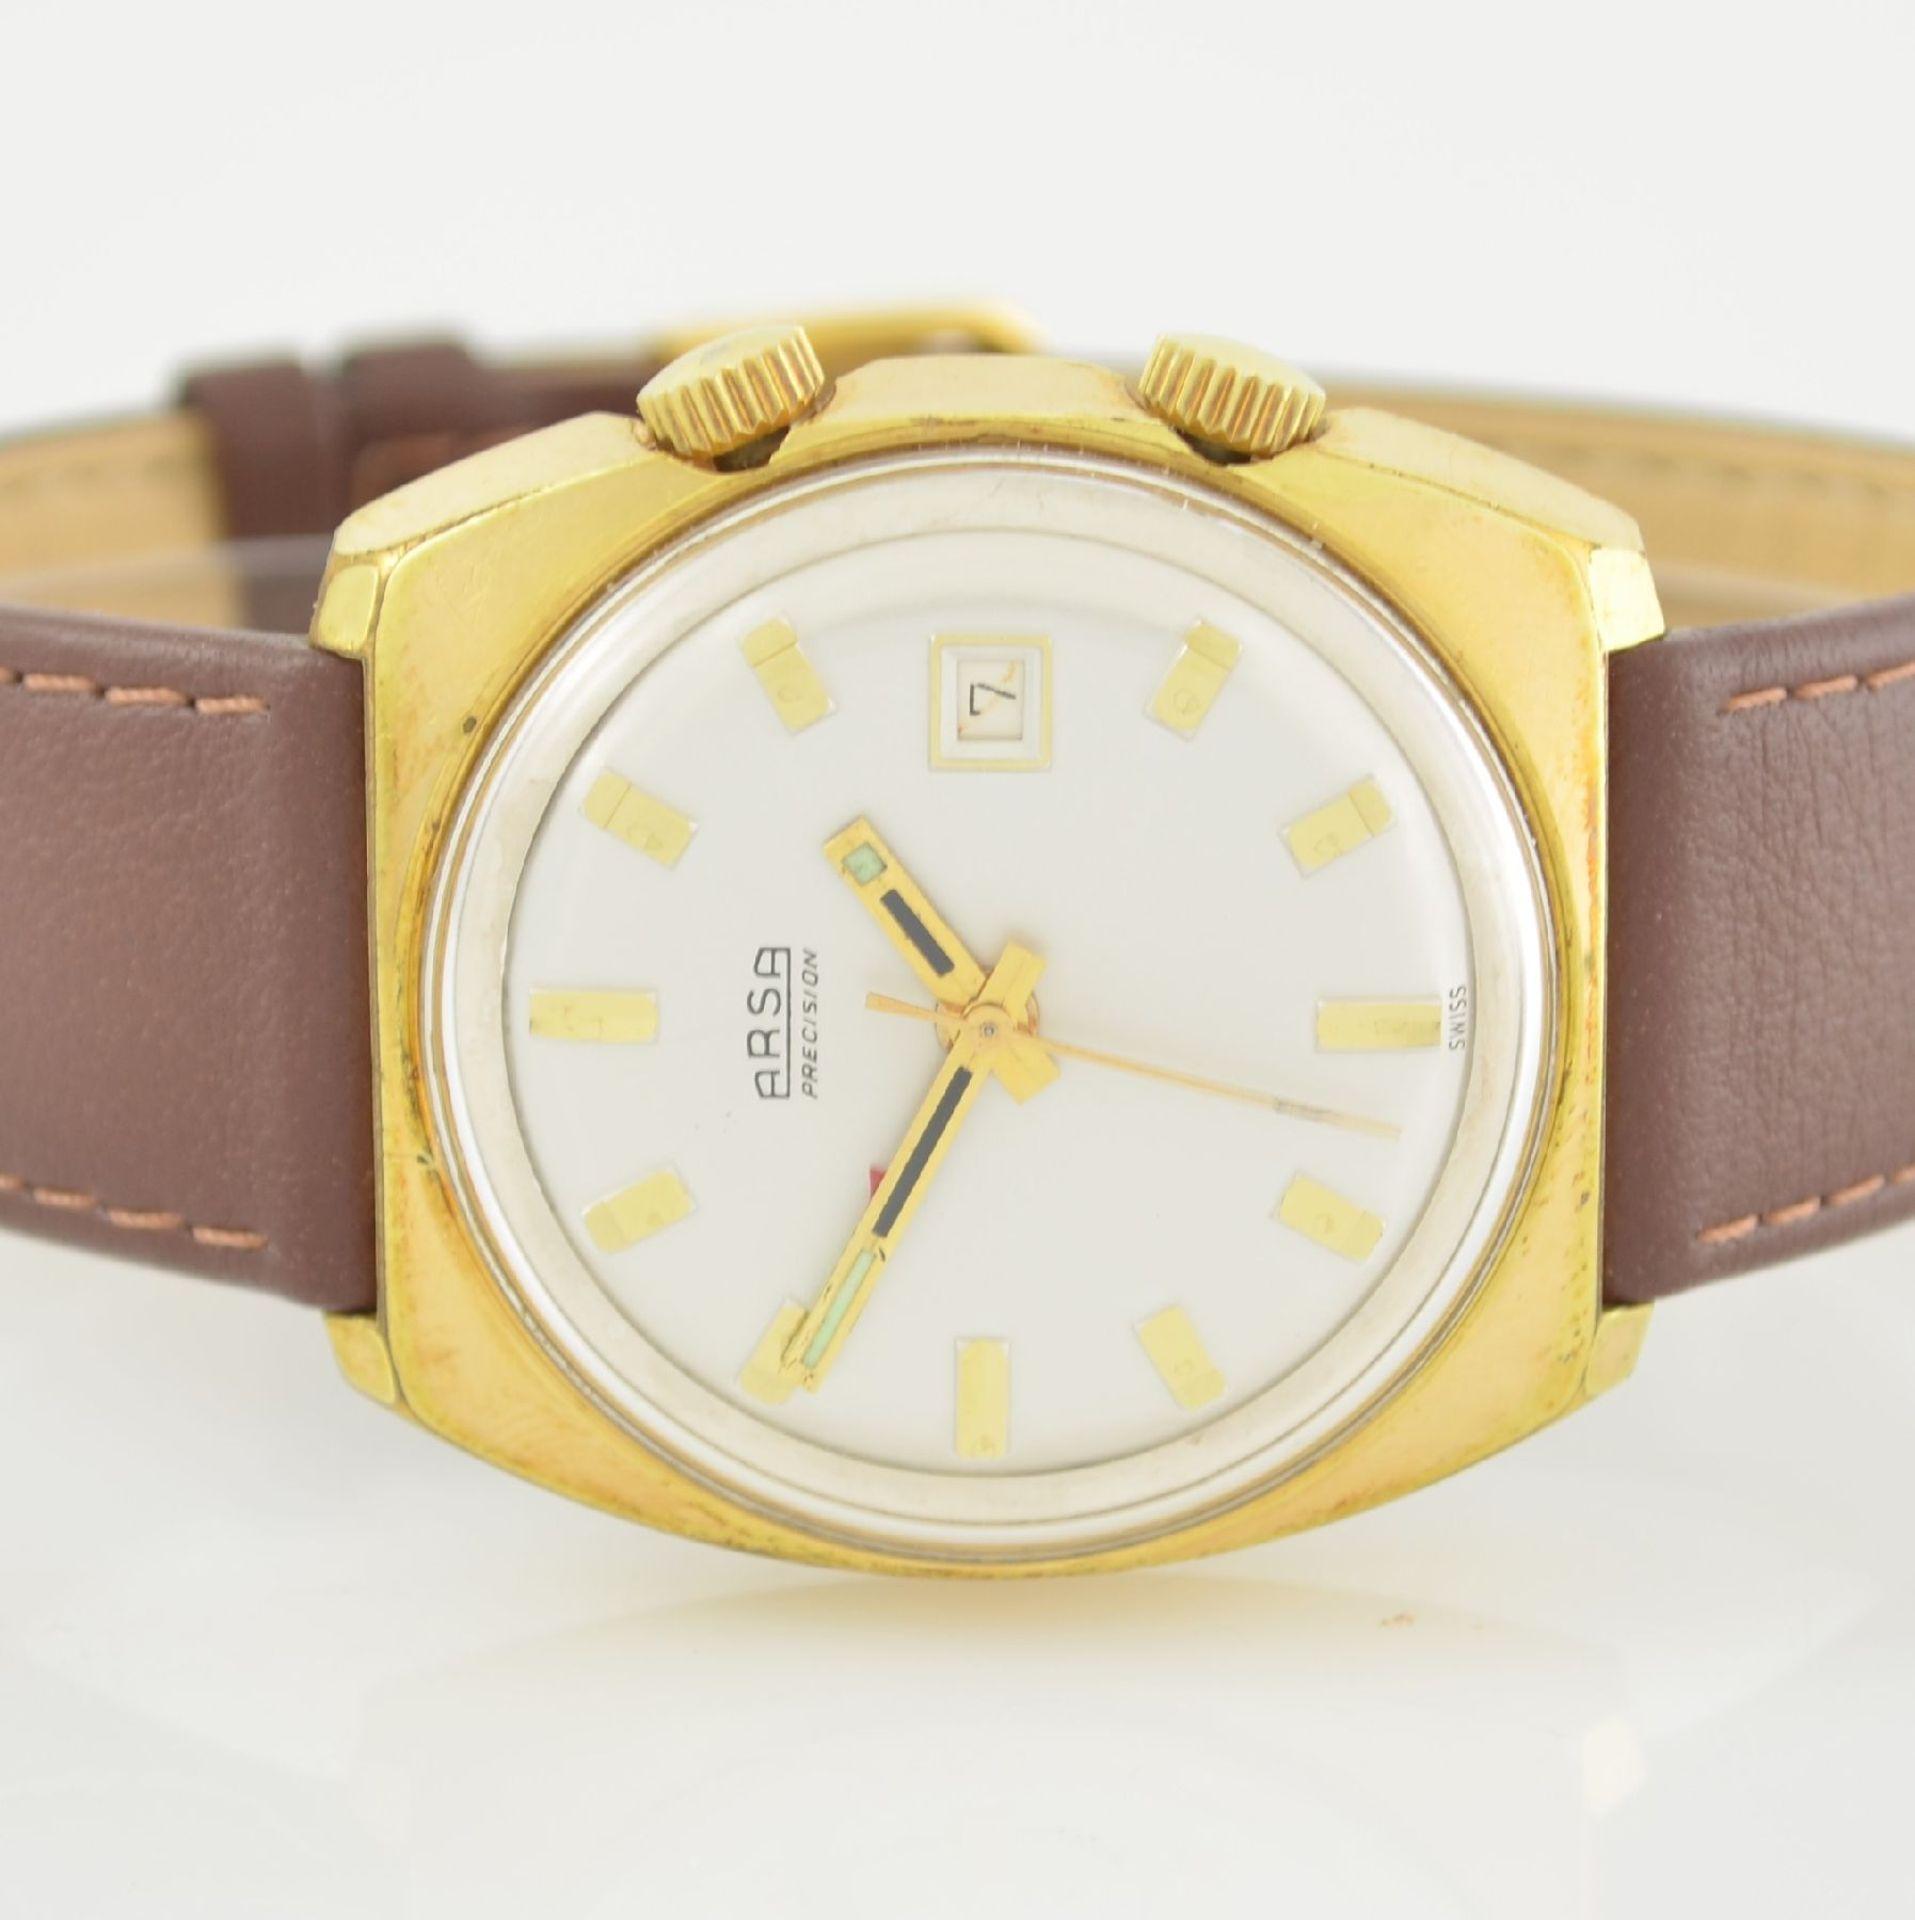 Konvolut: 2 Armbanduhren, beide Schweiz um 1970, beide Metall verg., 1 x Arsa Armbandwecker, Boden - Bild 2 aus 12